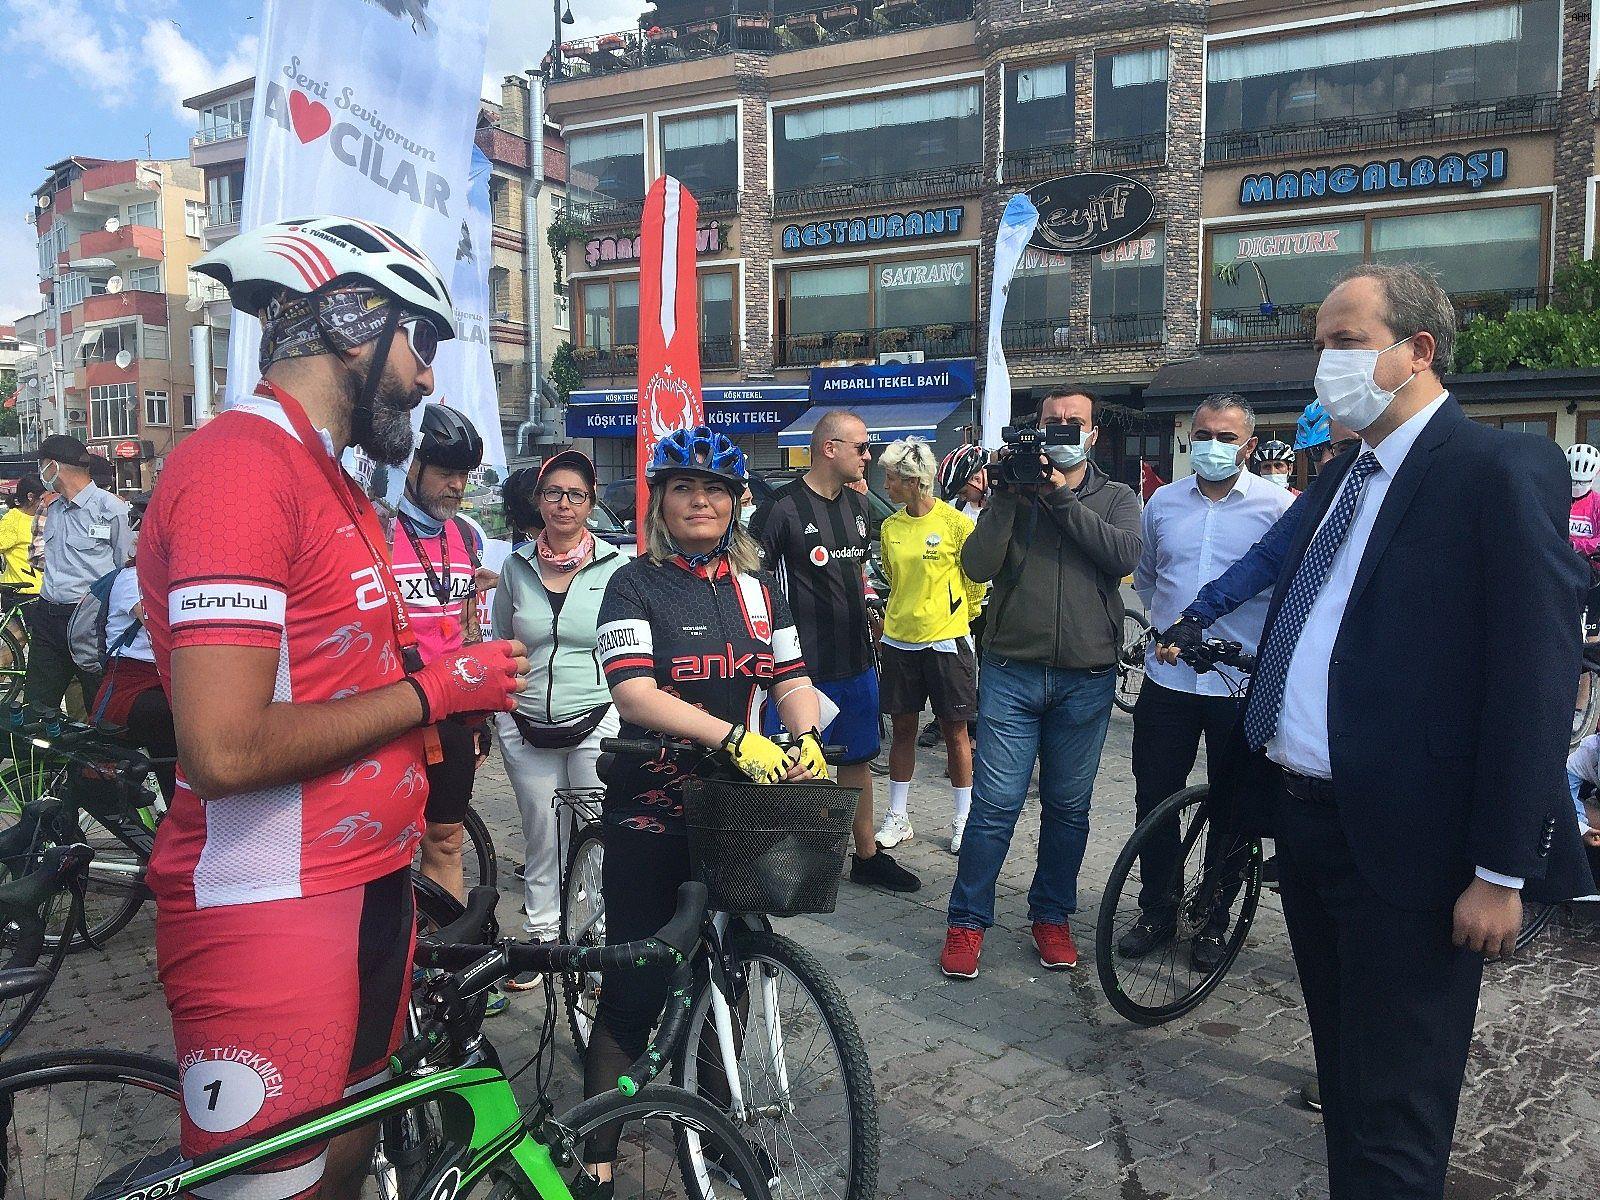 2021/06/avcilarda-bisikletseverler-dunya-bisiklet-gunu-icin-pedal-cevirdi-20210603AW33-1.jpg